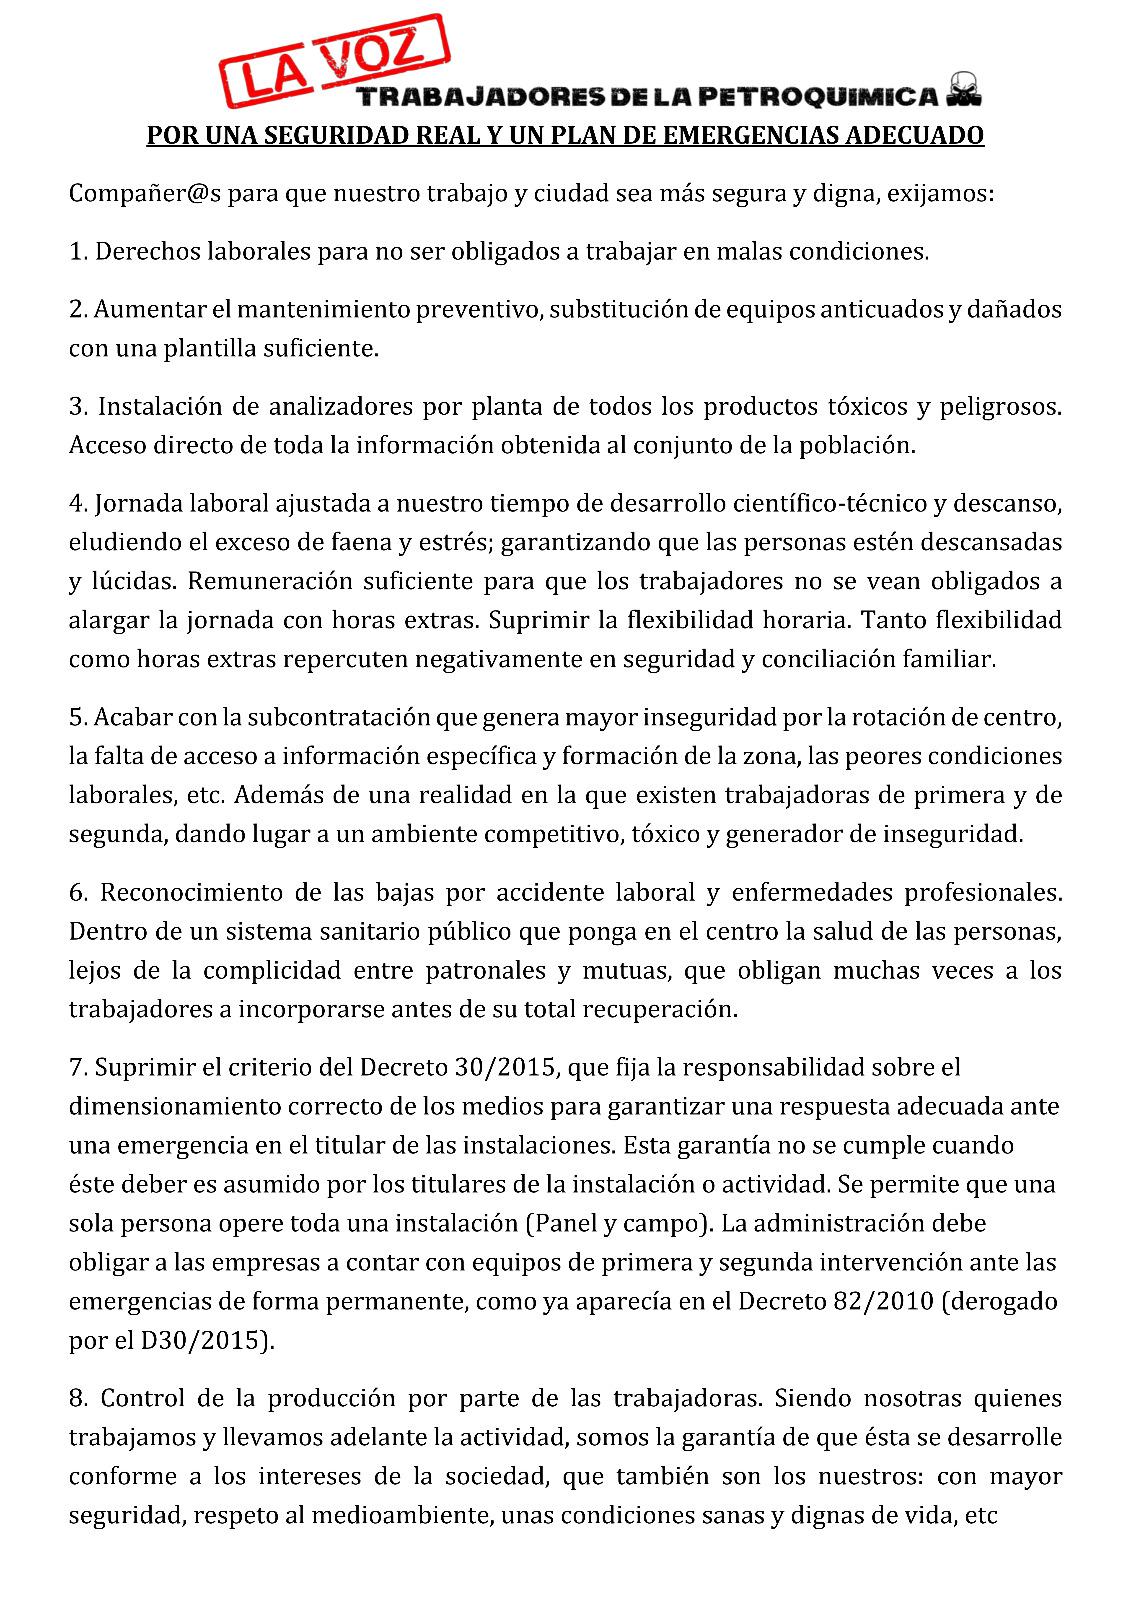 reivindicaciones_huelga.jpg